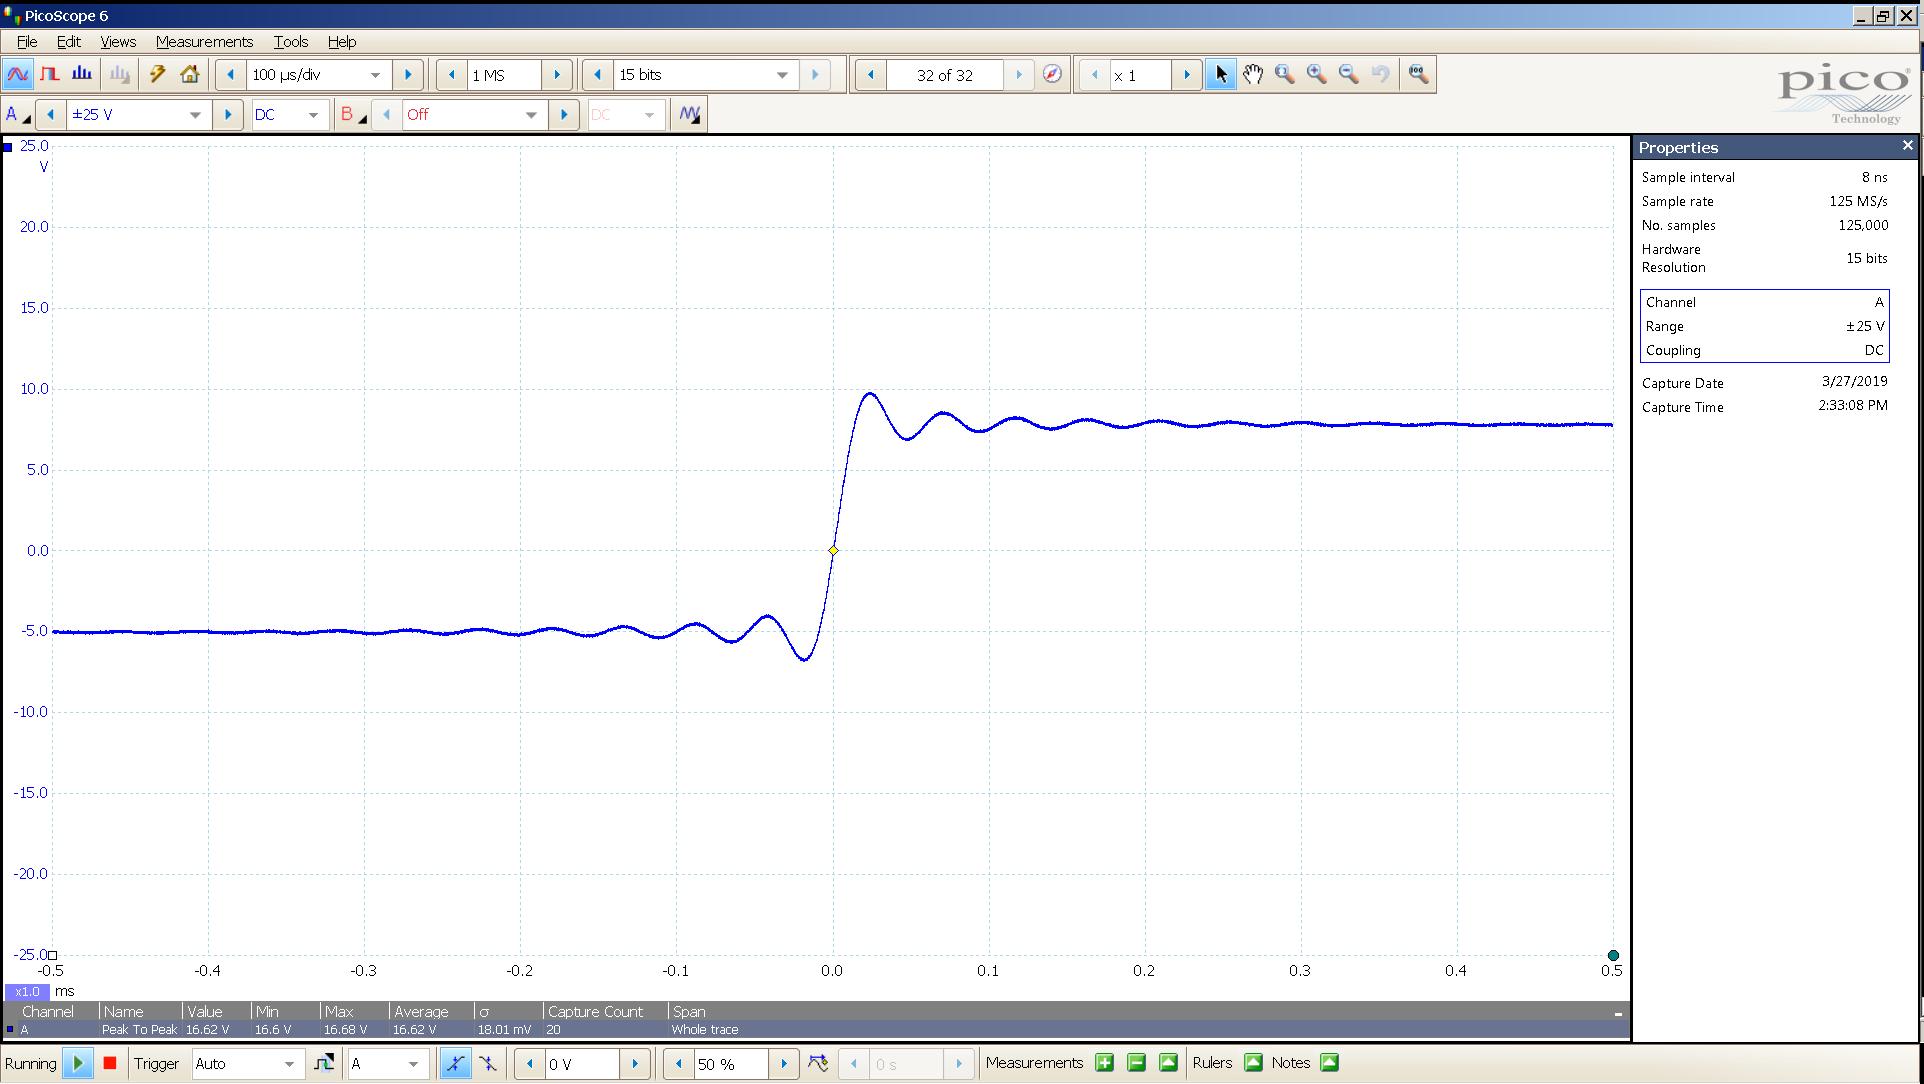 20190323-23 solaris Bal 20 Hz sqr -3 dBFS 16 Vpp 100uS div - AES 44K.PNG